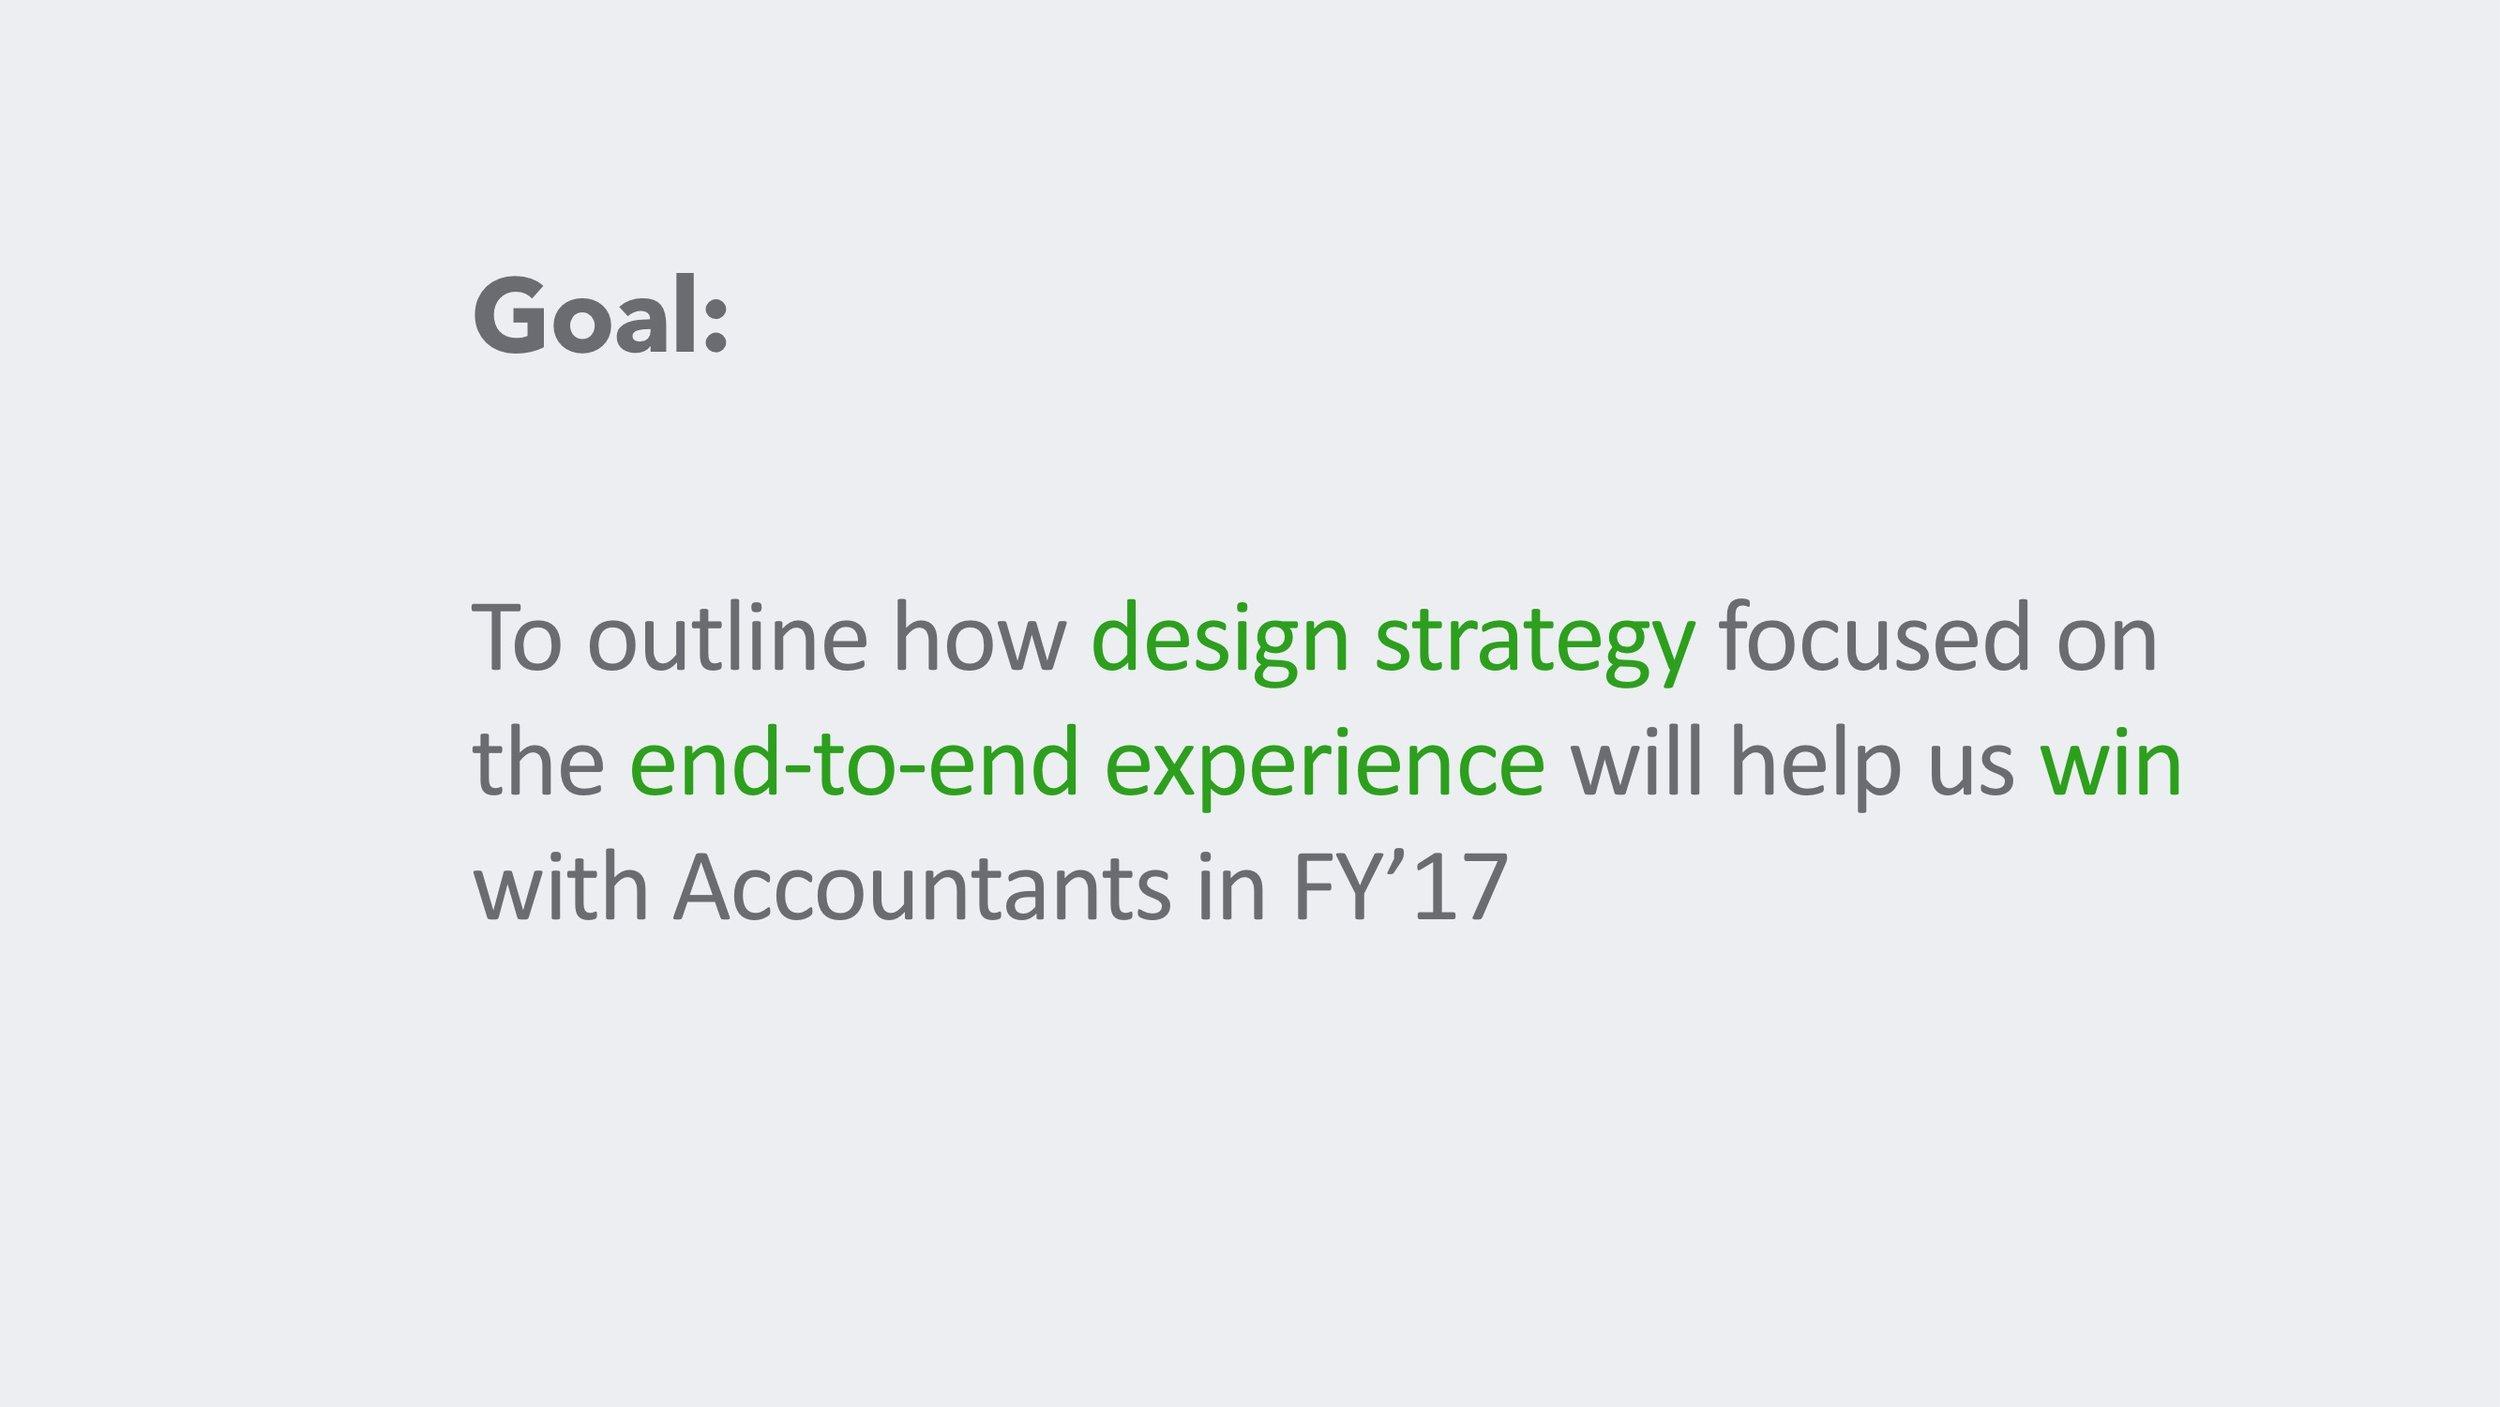 Strategy for Accountant v2.5 2.jpeg